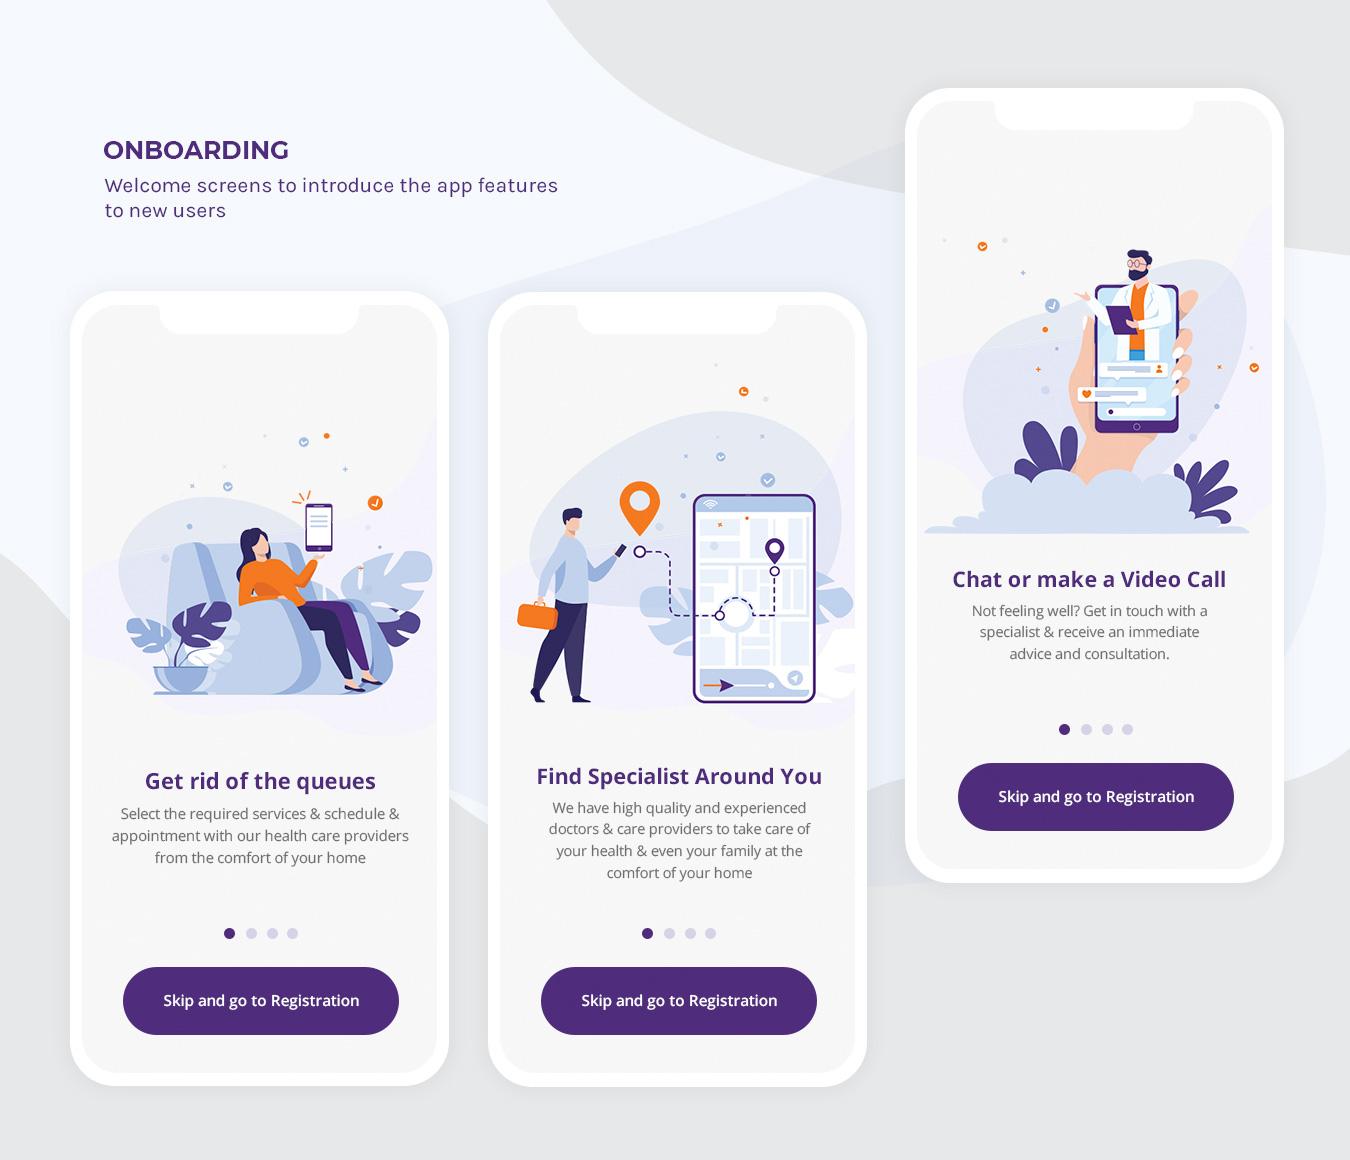 TrueCare2U - Mobile Application - Onboardings